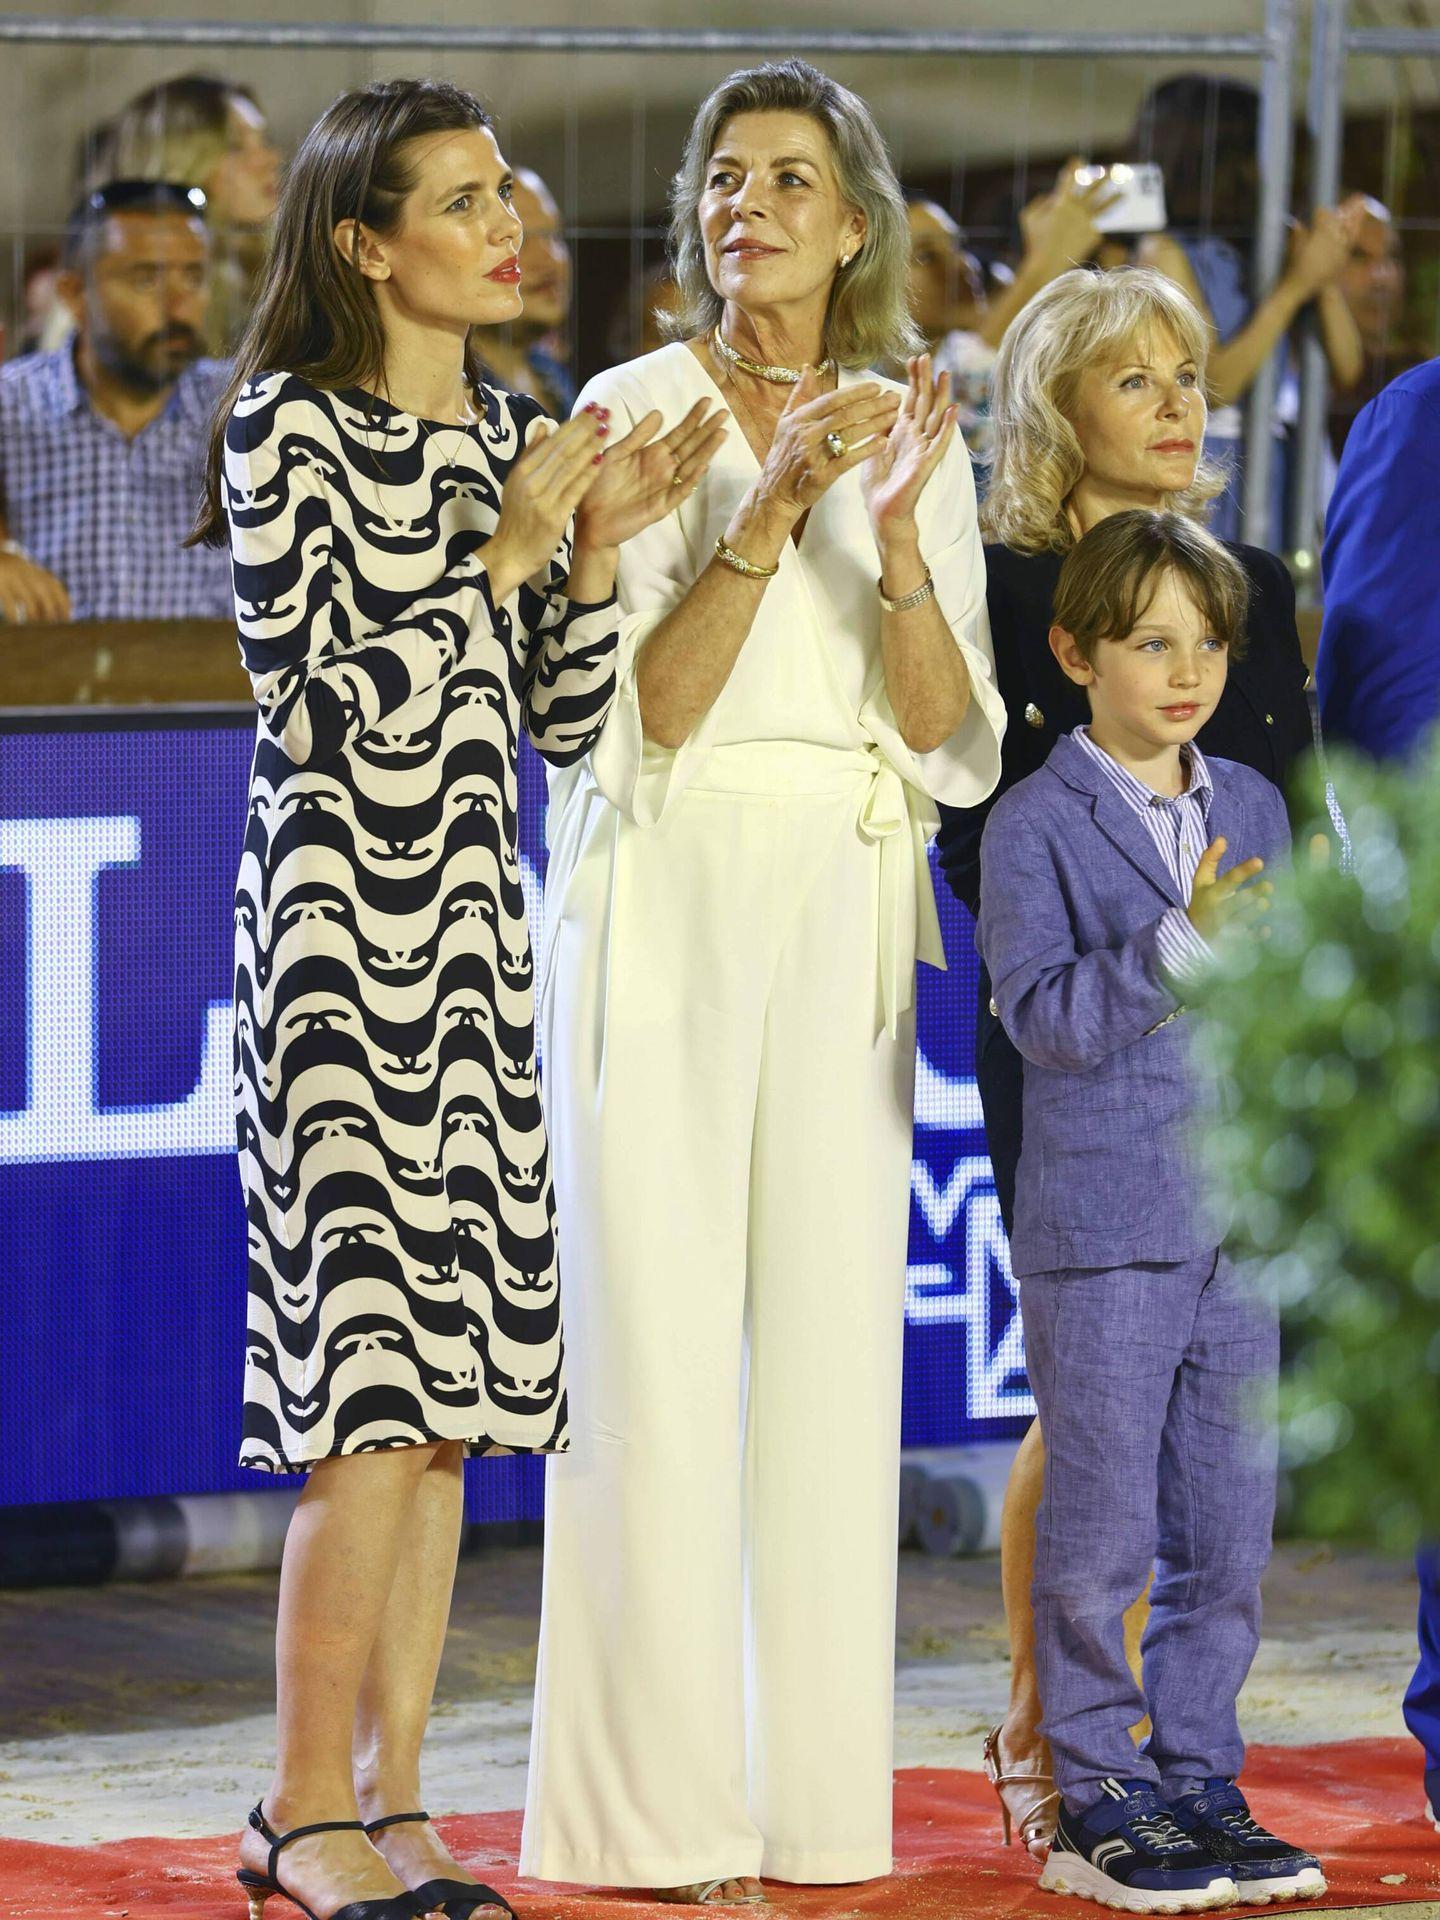 Carolina de Mónaco, junto a Carlota Casiraghi y su nieto Raphaël. (Cordon Press)